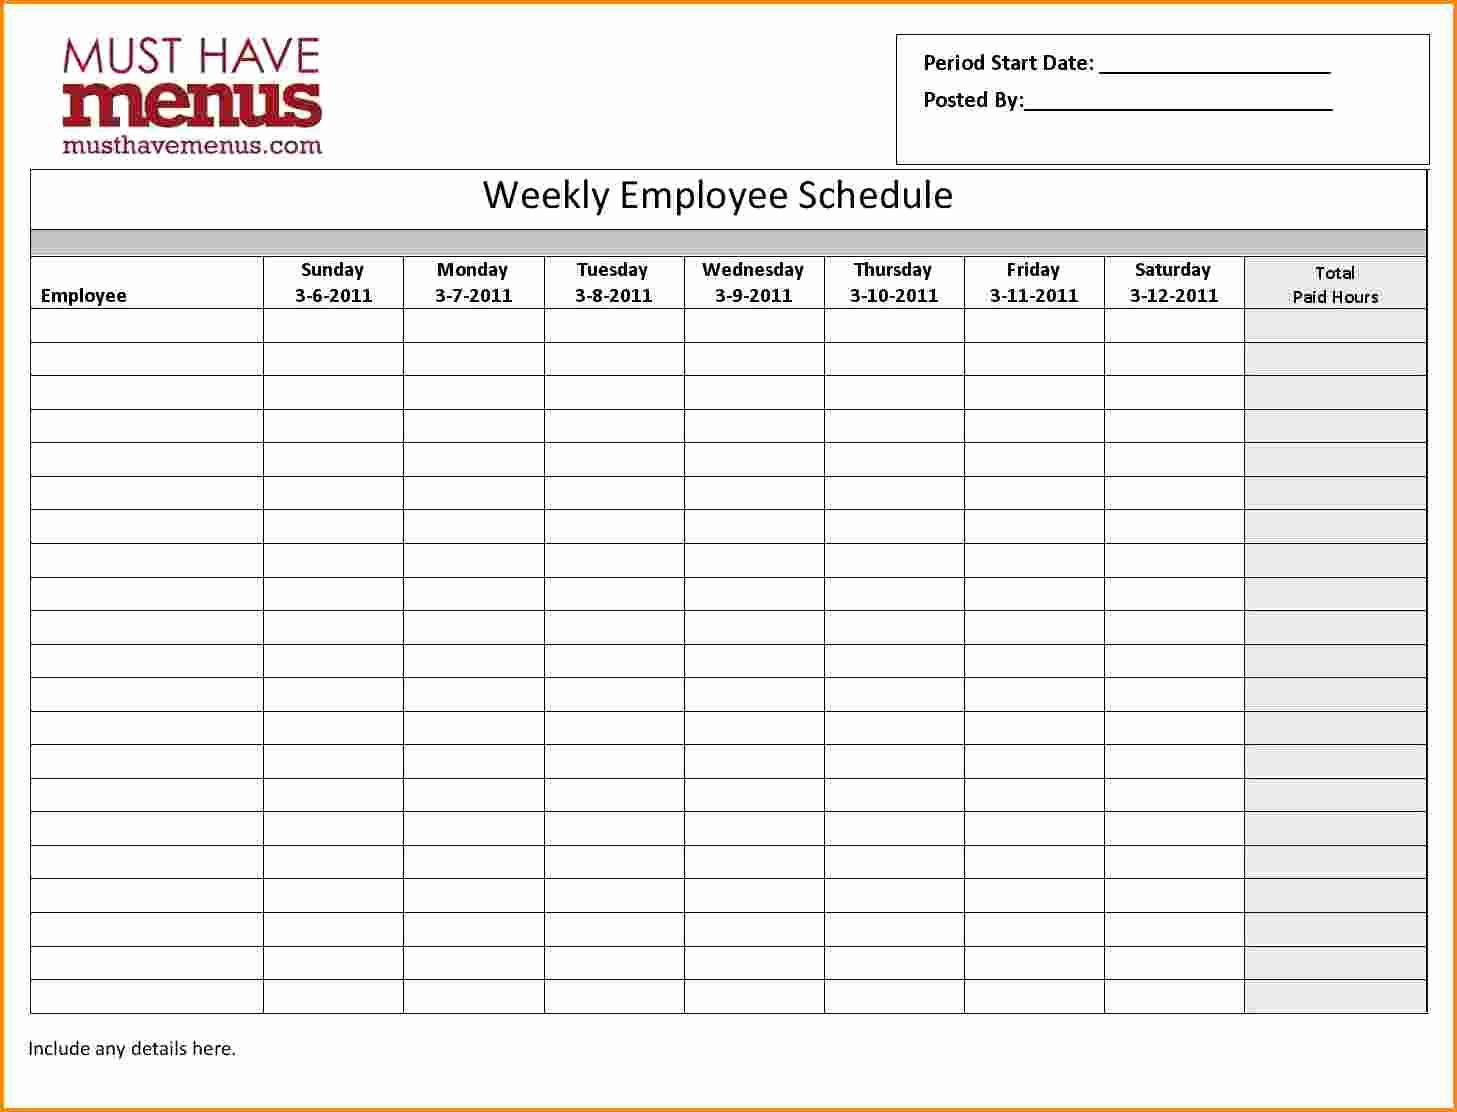 Employee Monthly Work Schedule Template Beautiful 7 Monthly Employee Schedule Template